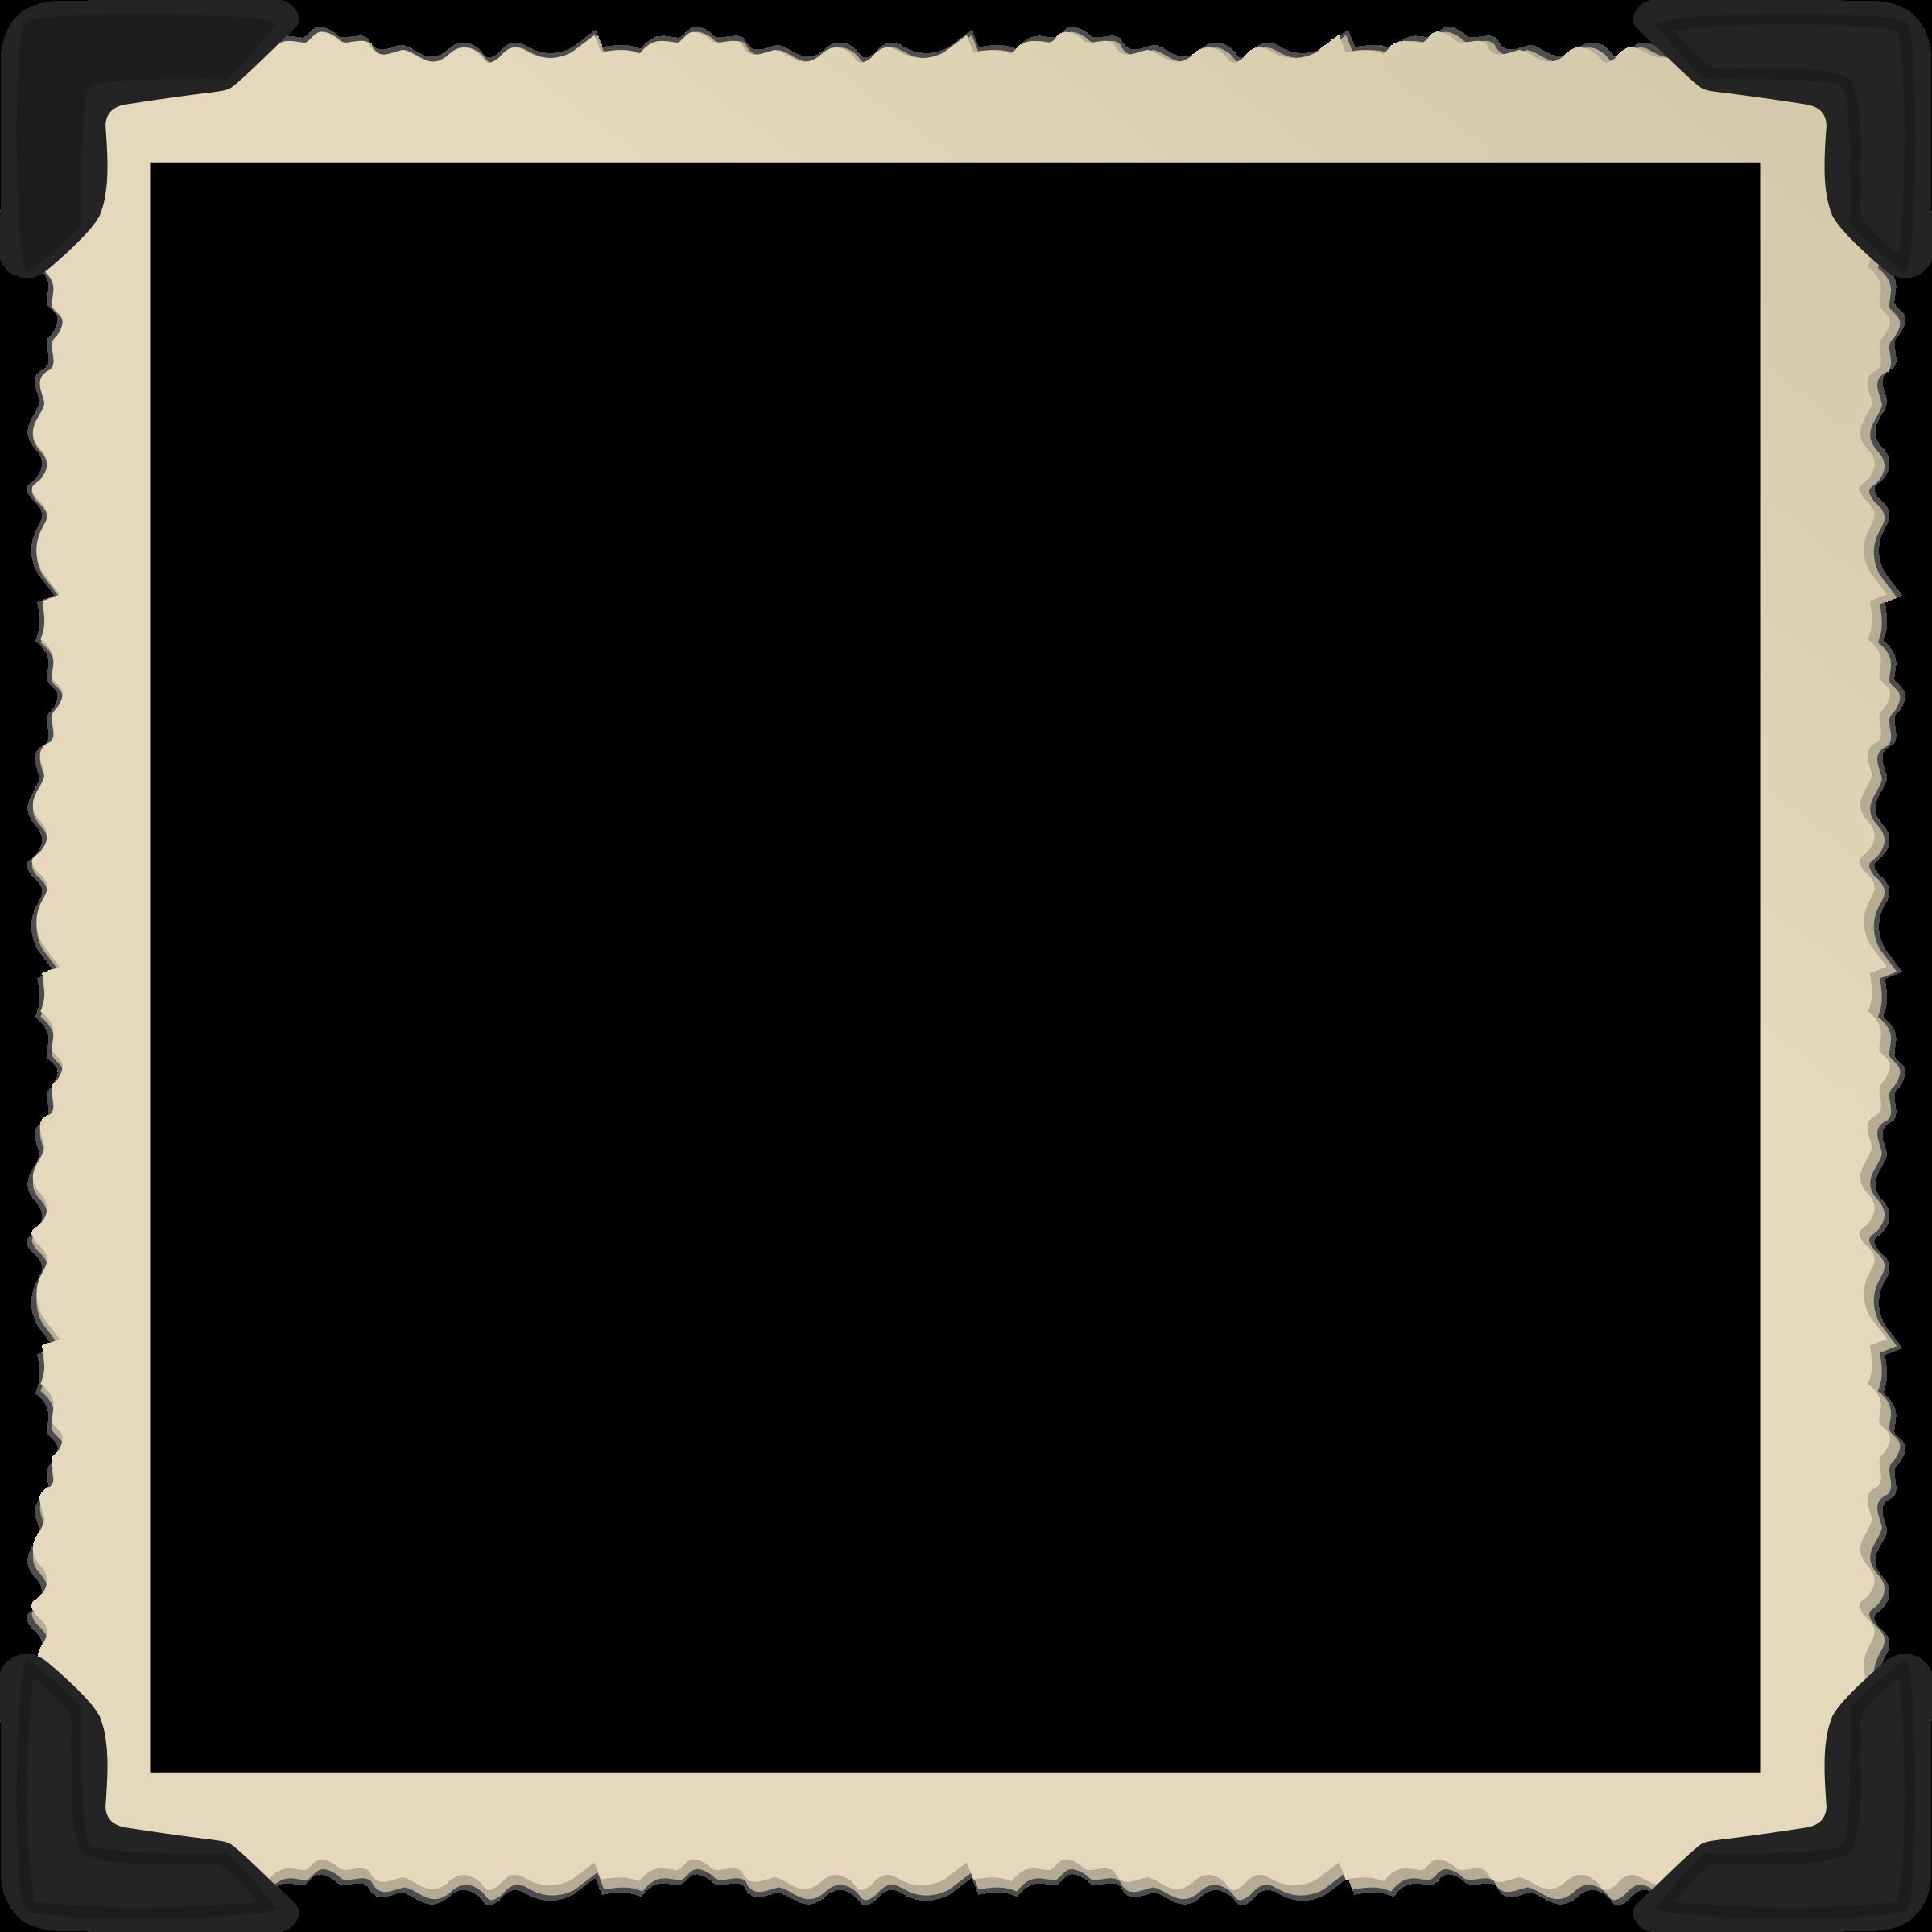 vector transparent Photograph clipart. Frame big image png